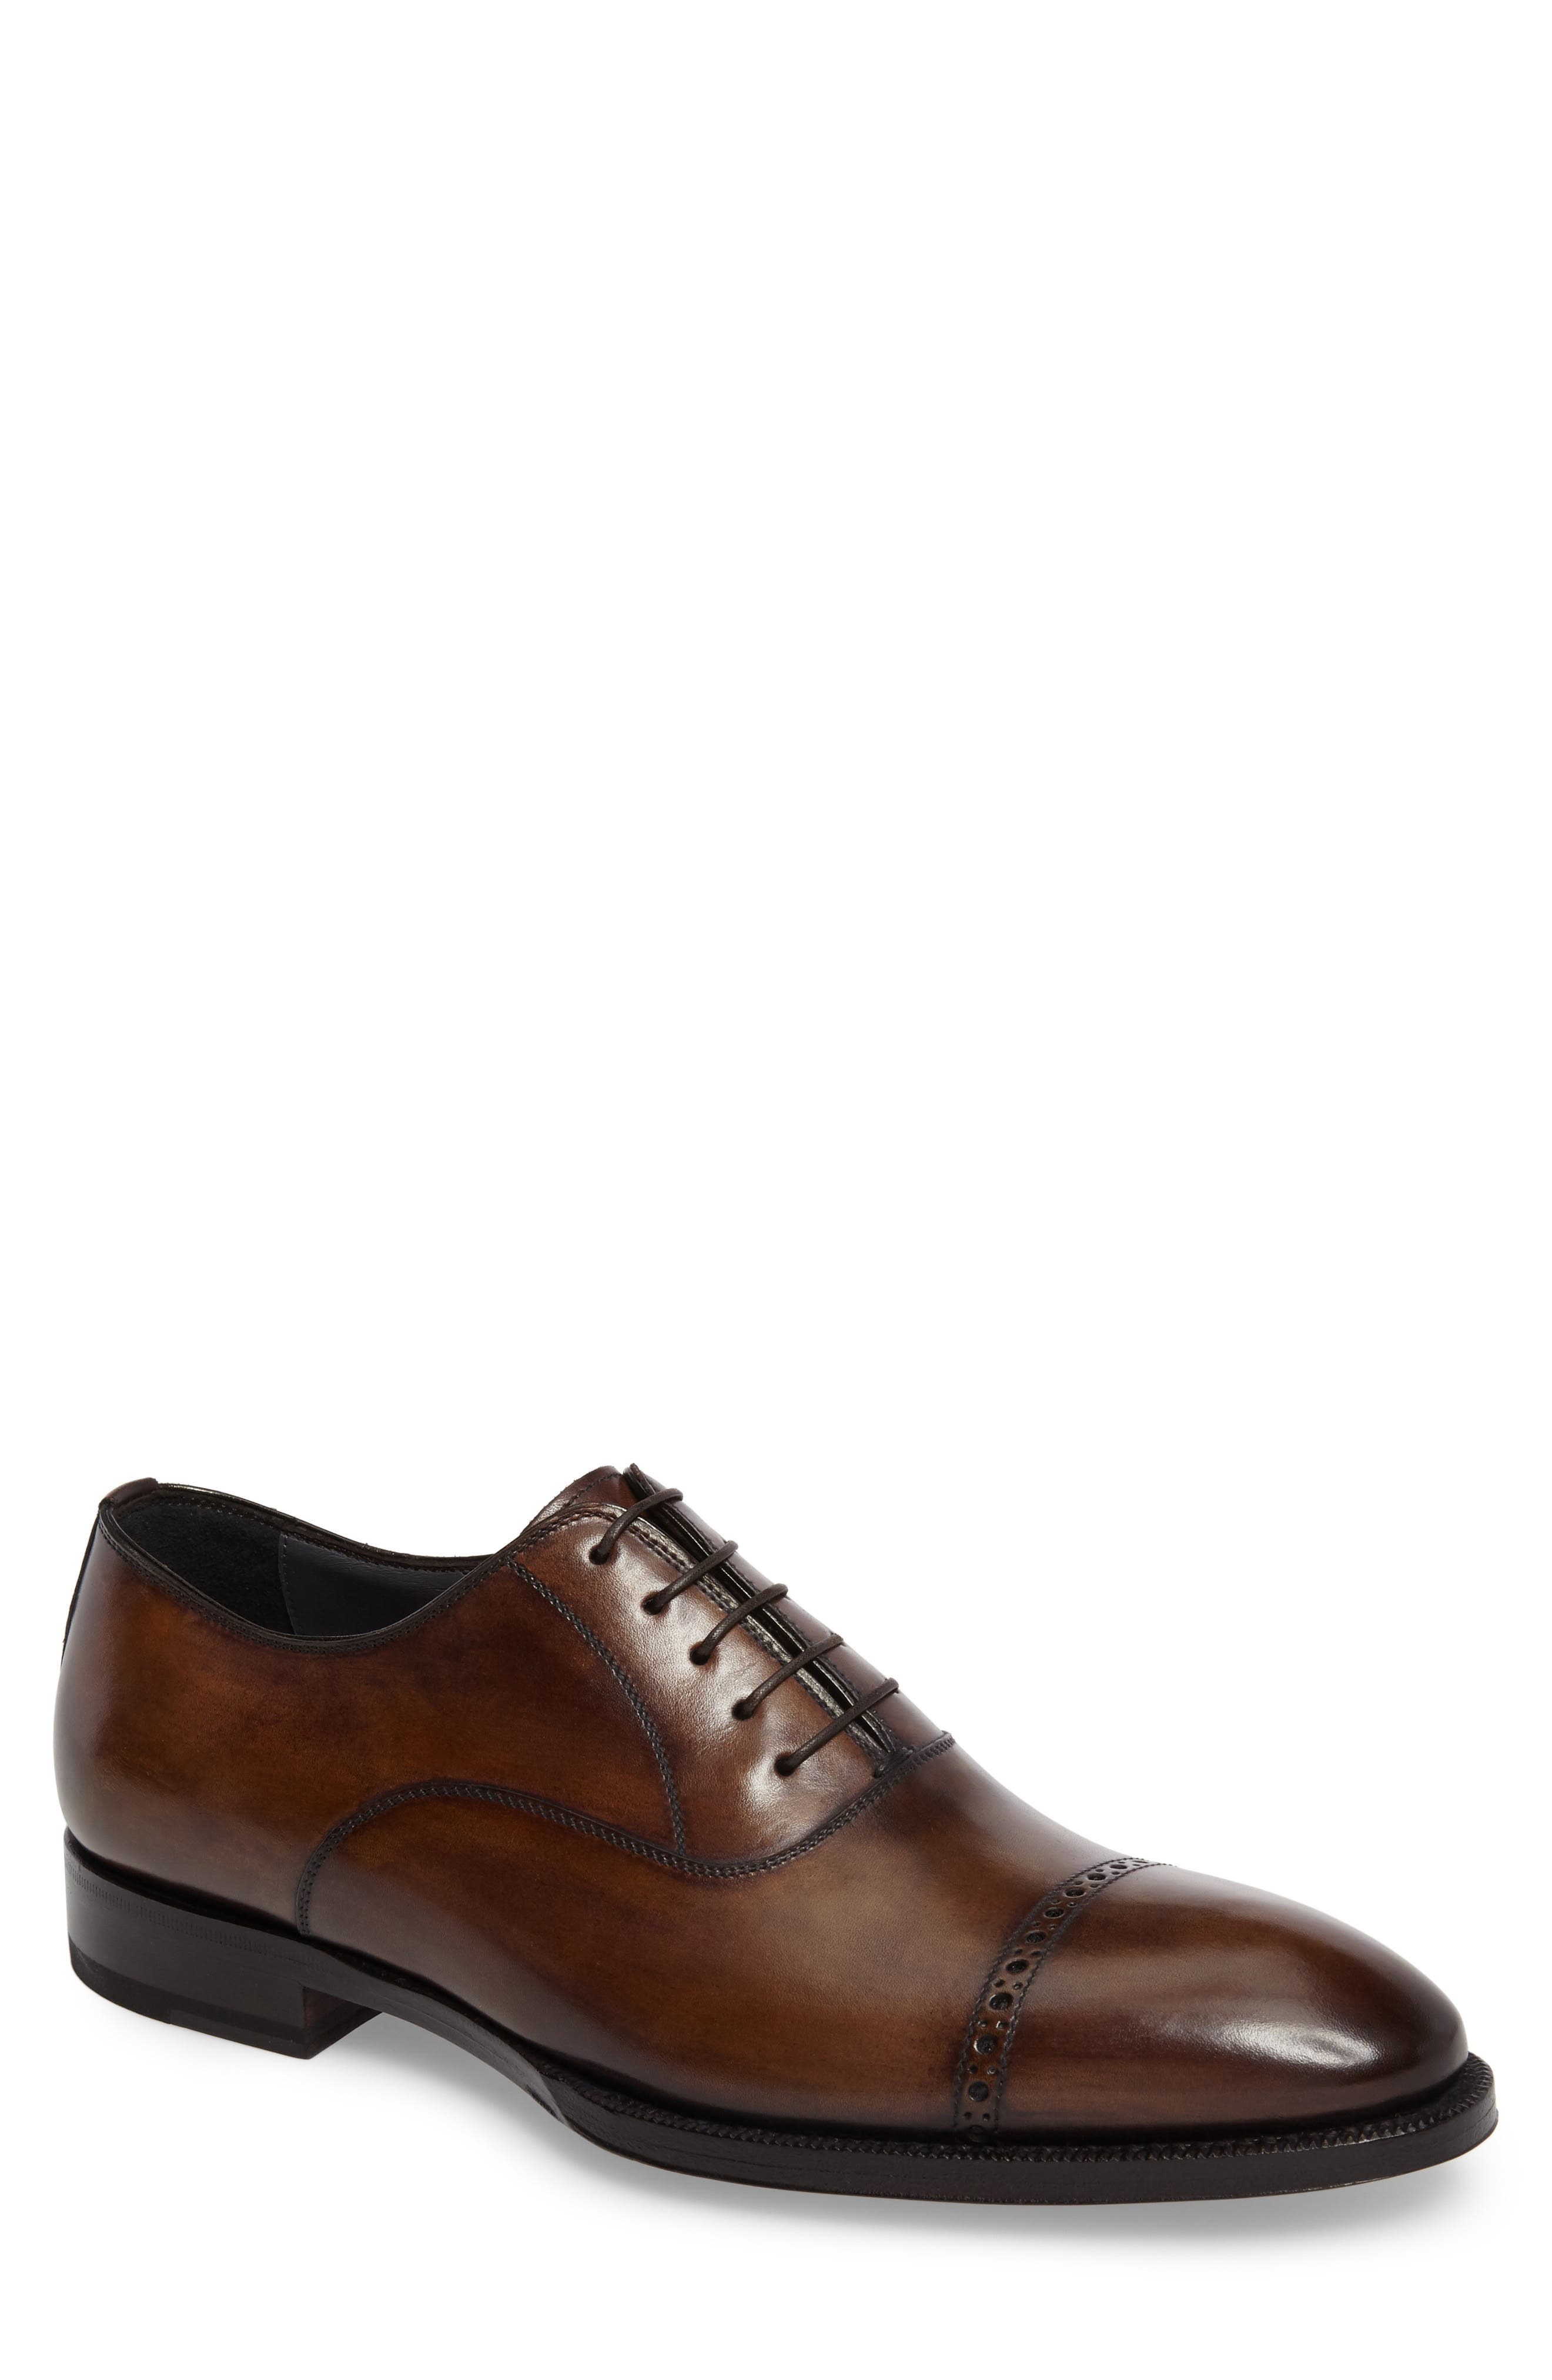 DiGallo Bianco Cap Toe Oxford,                             Main thumbnail 1, color,                             Zenzero Leather